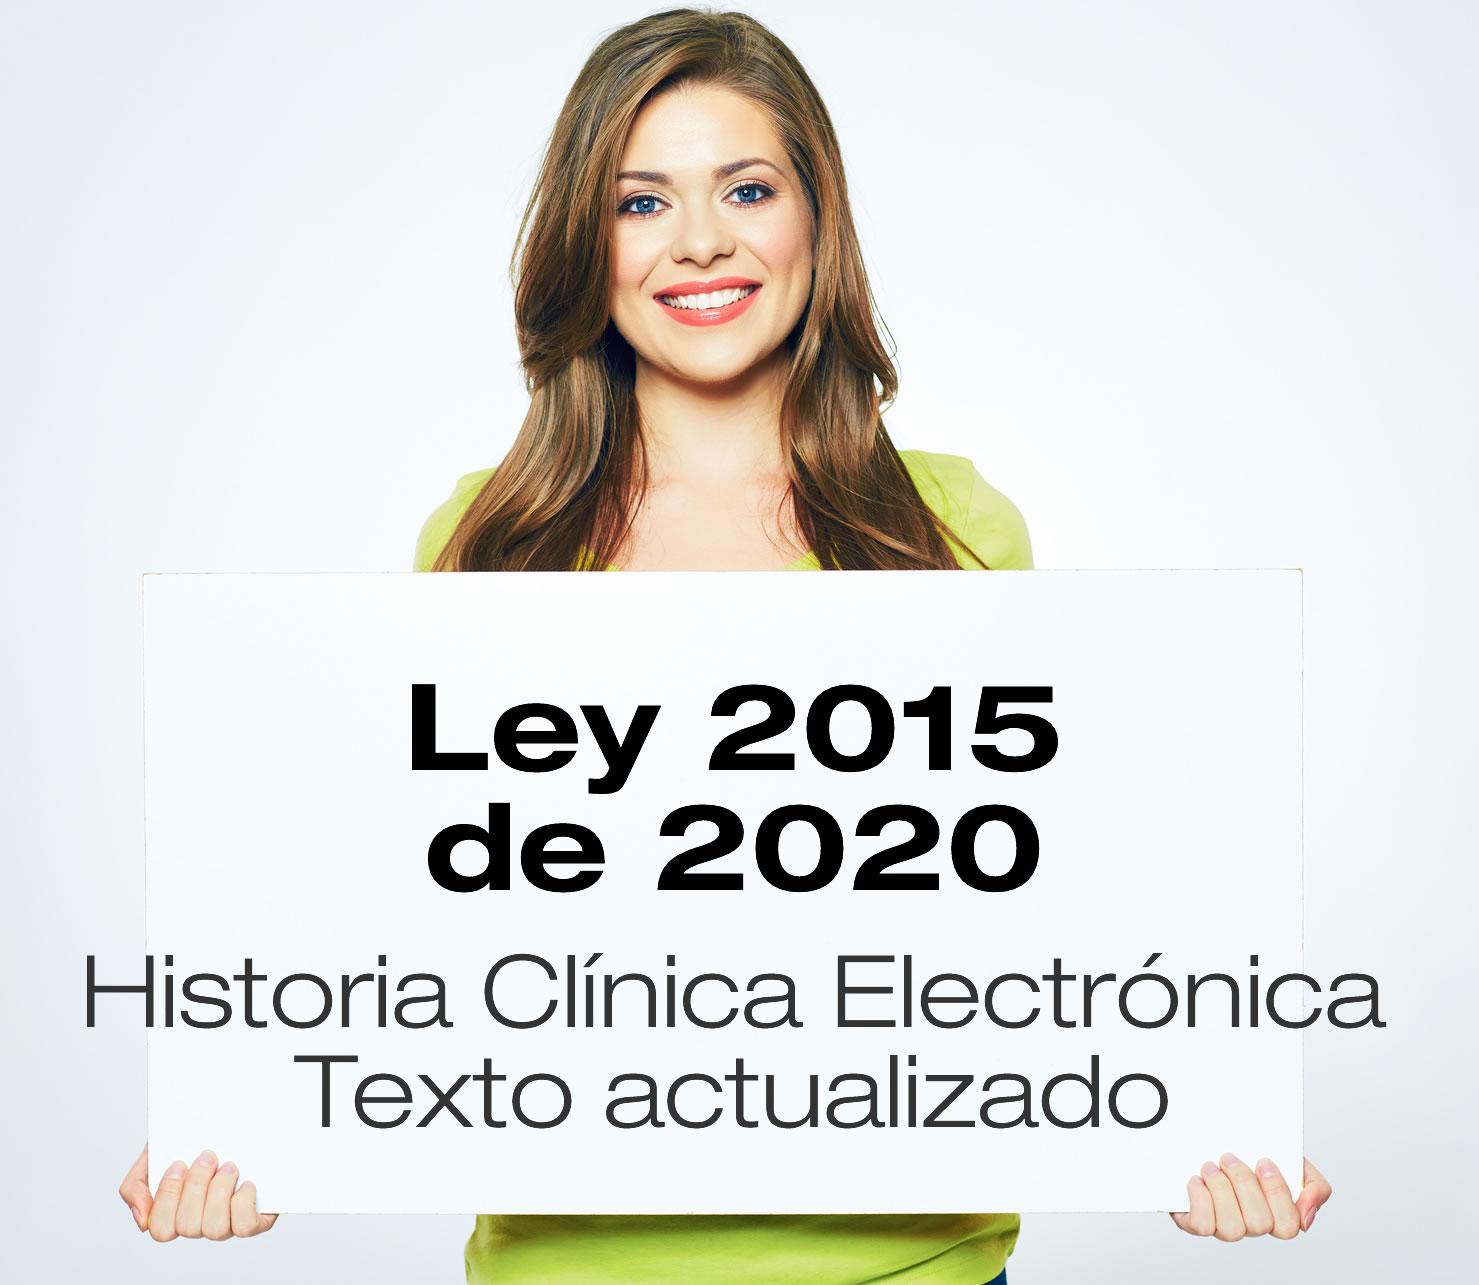 Ley 2015 de 2020 - Historia Clínica Electrónica